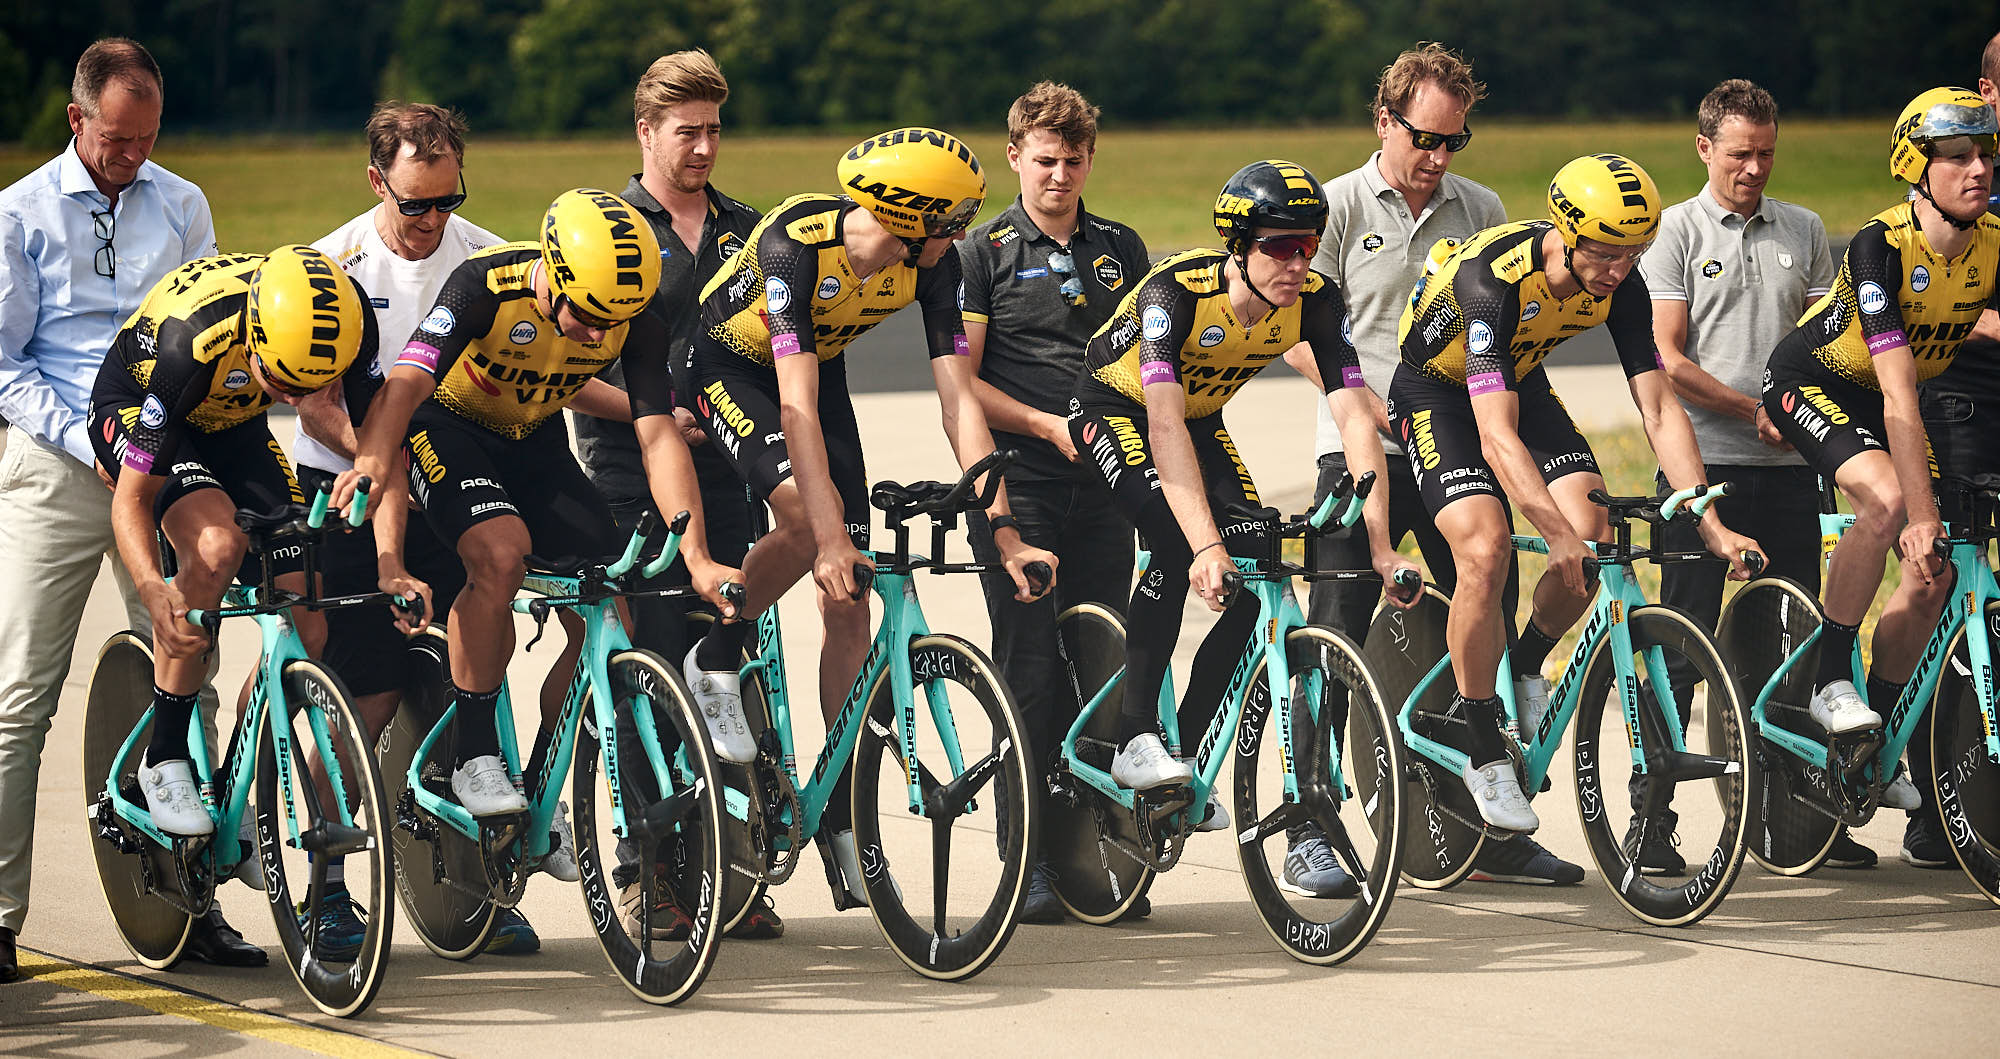 Jumbo-Visma cyclists preparing for time trial training